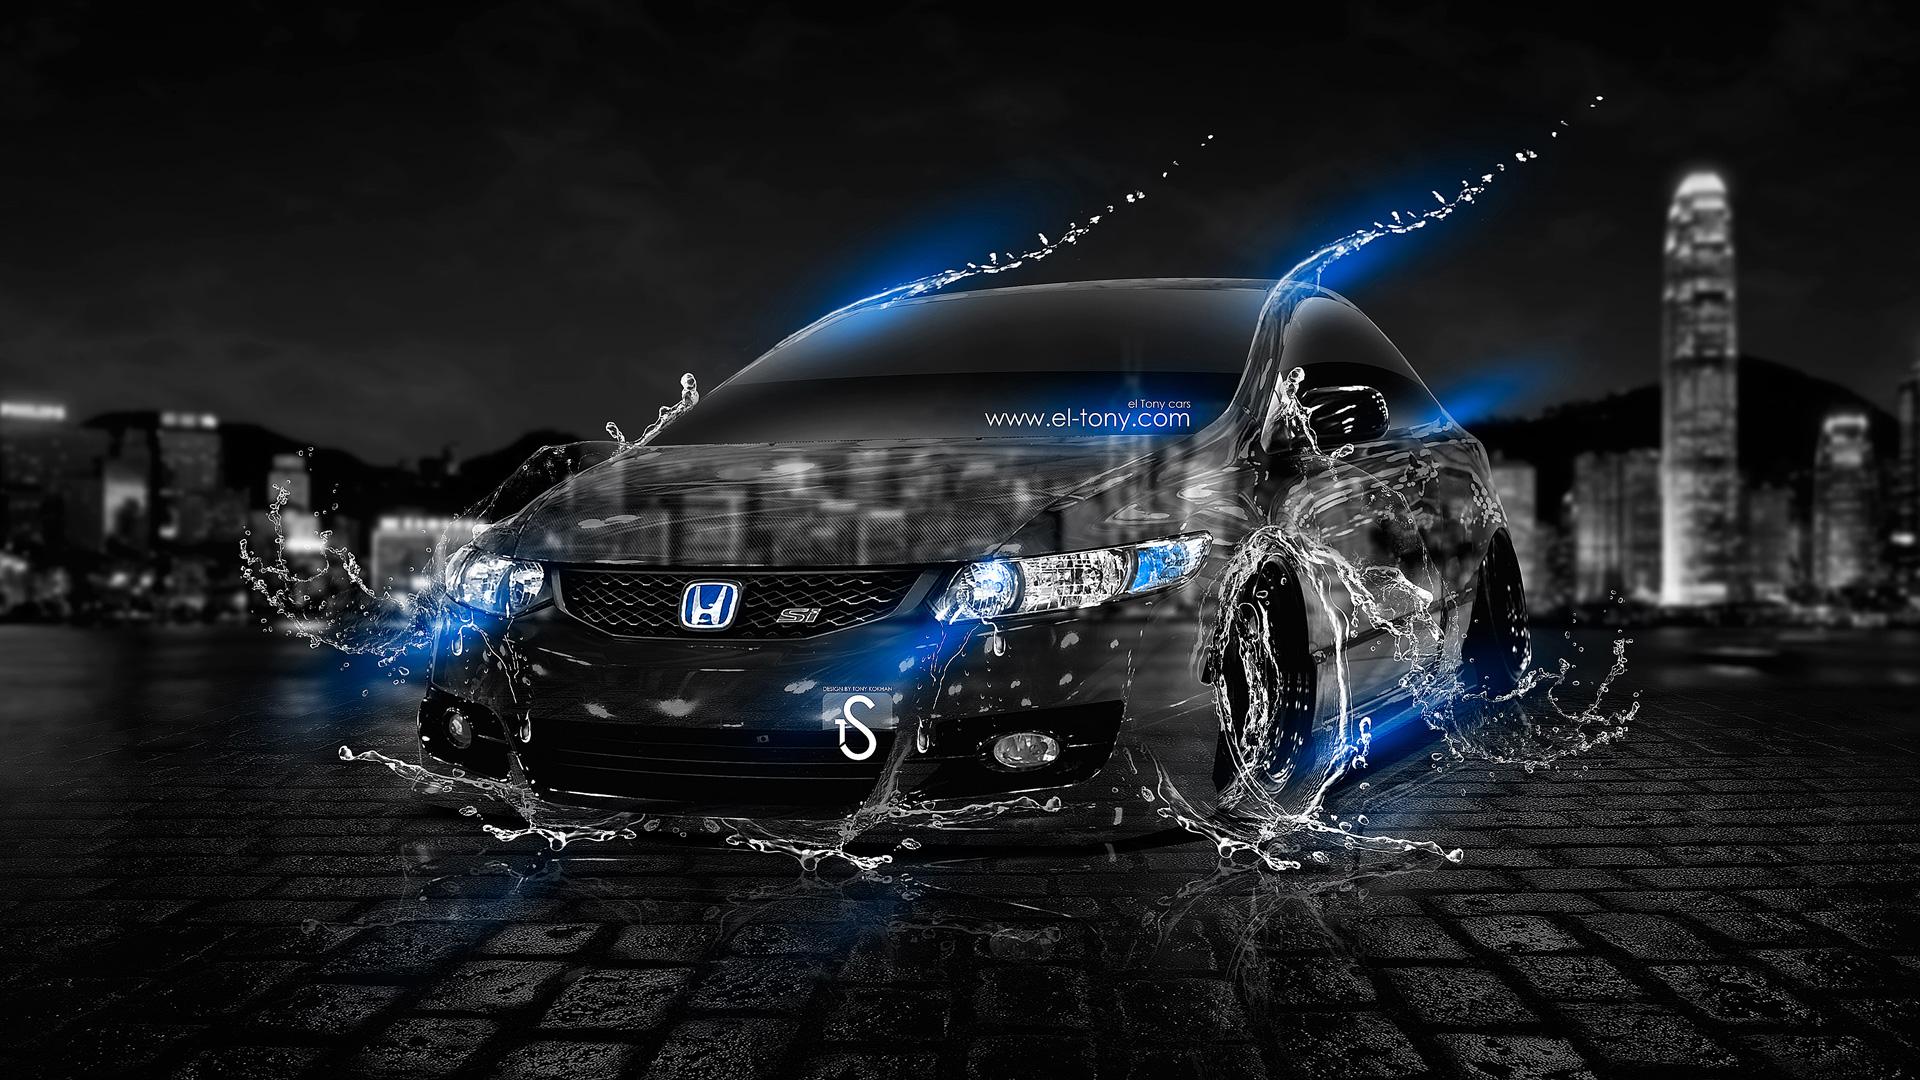 30  Amazing <b>Cars</b> Photos with Photoshop <b>Water</b> Effect